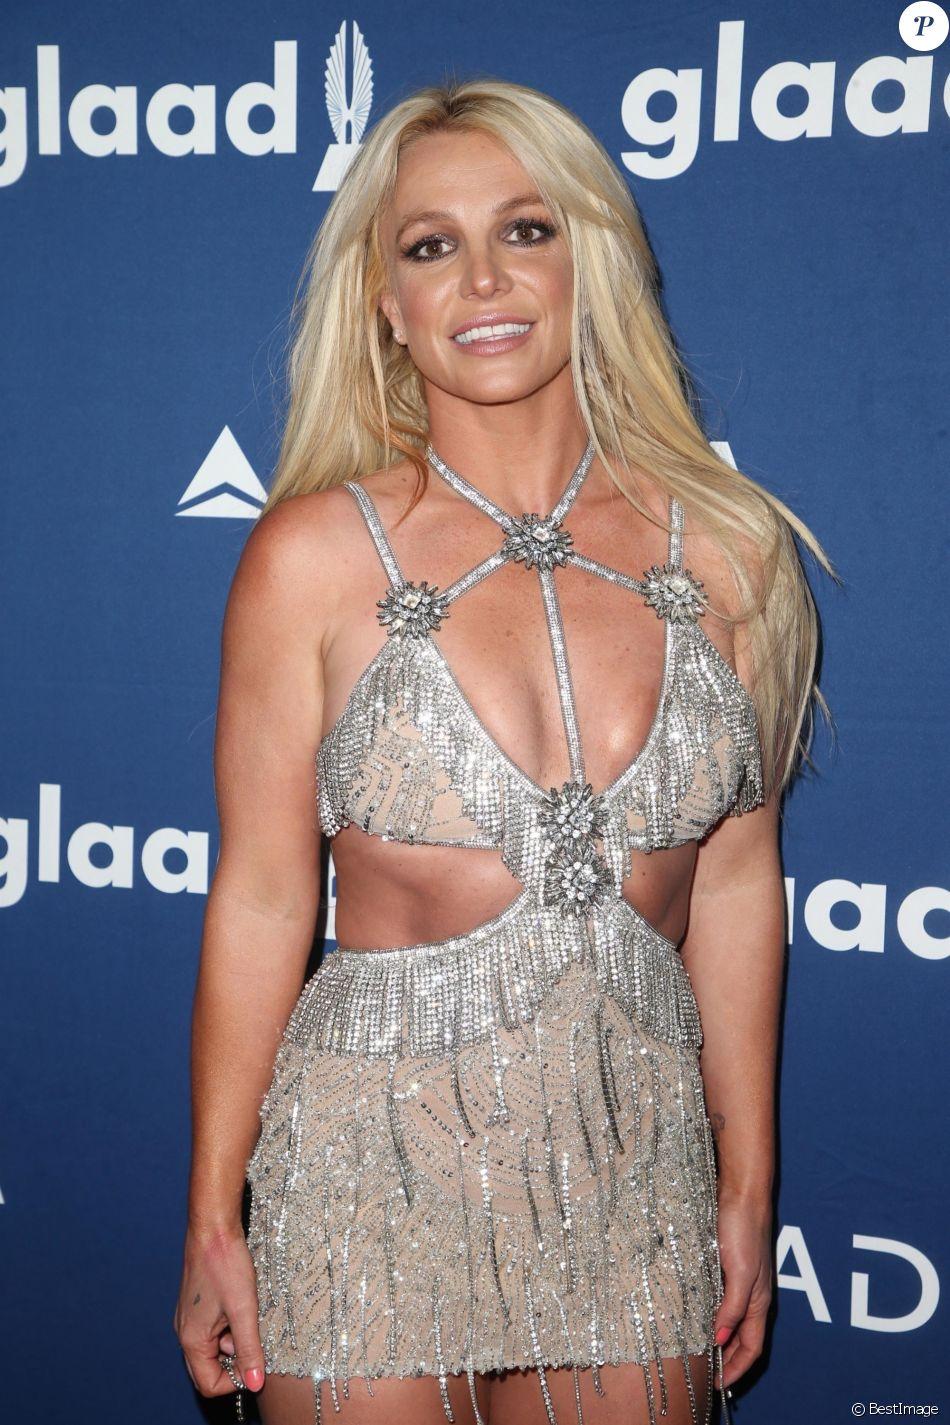 Britney Spears à la soirée GLAAD Media Awards Rising Stars à l'hôtel Beverly Hilton à Beverly Hills, le 12 avril 2018